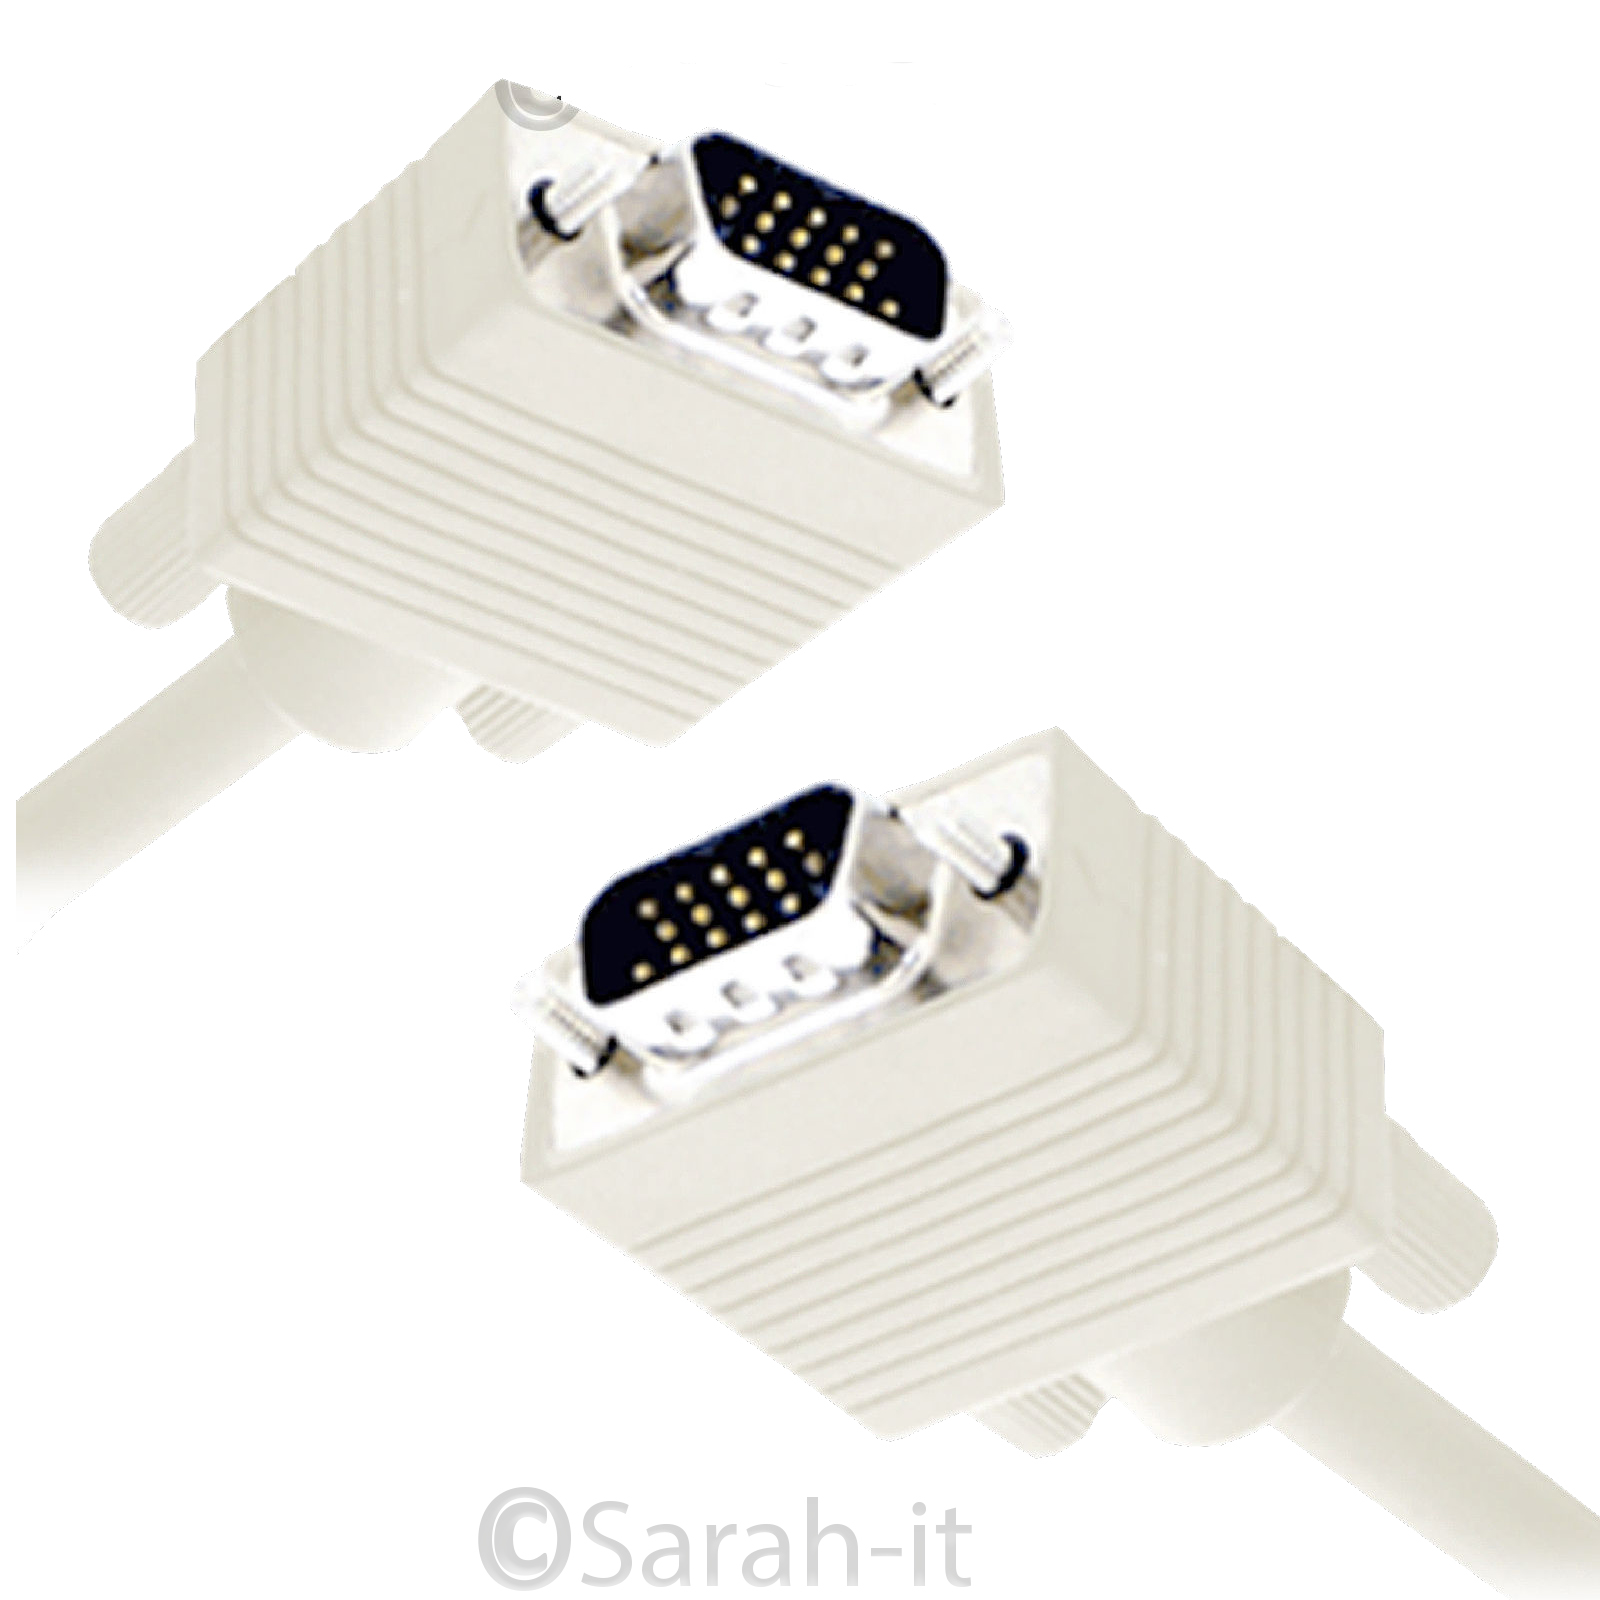 Shielded-S-VGA-Monitor-LCD-PC-Cable-1M-1-5M-2M-2-5M-3M-5M-7M-10M-15M-20M-25M-30M